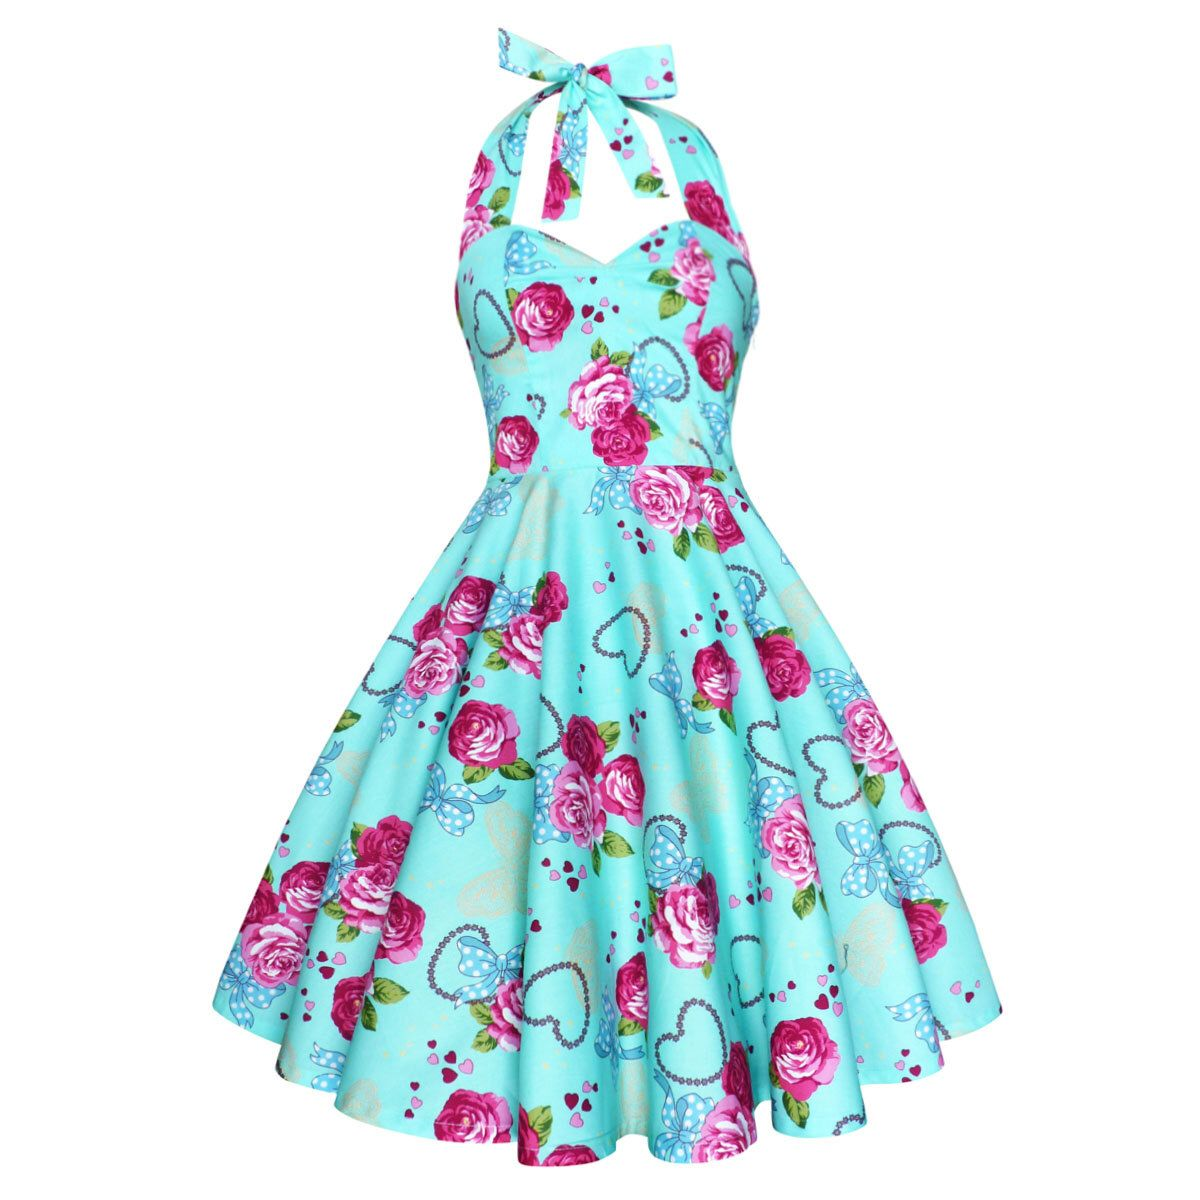 Pinup Dress Pastel Blue Rose Vintage 50s Rockabilly Clothing Pin Up ...